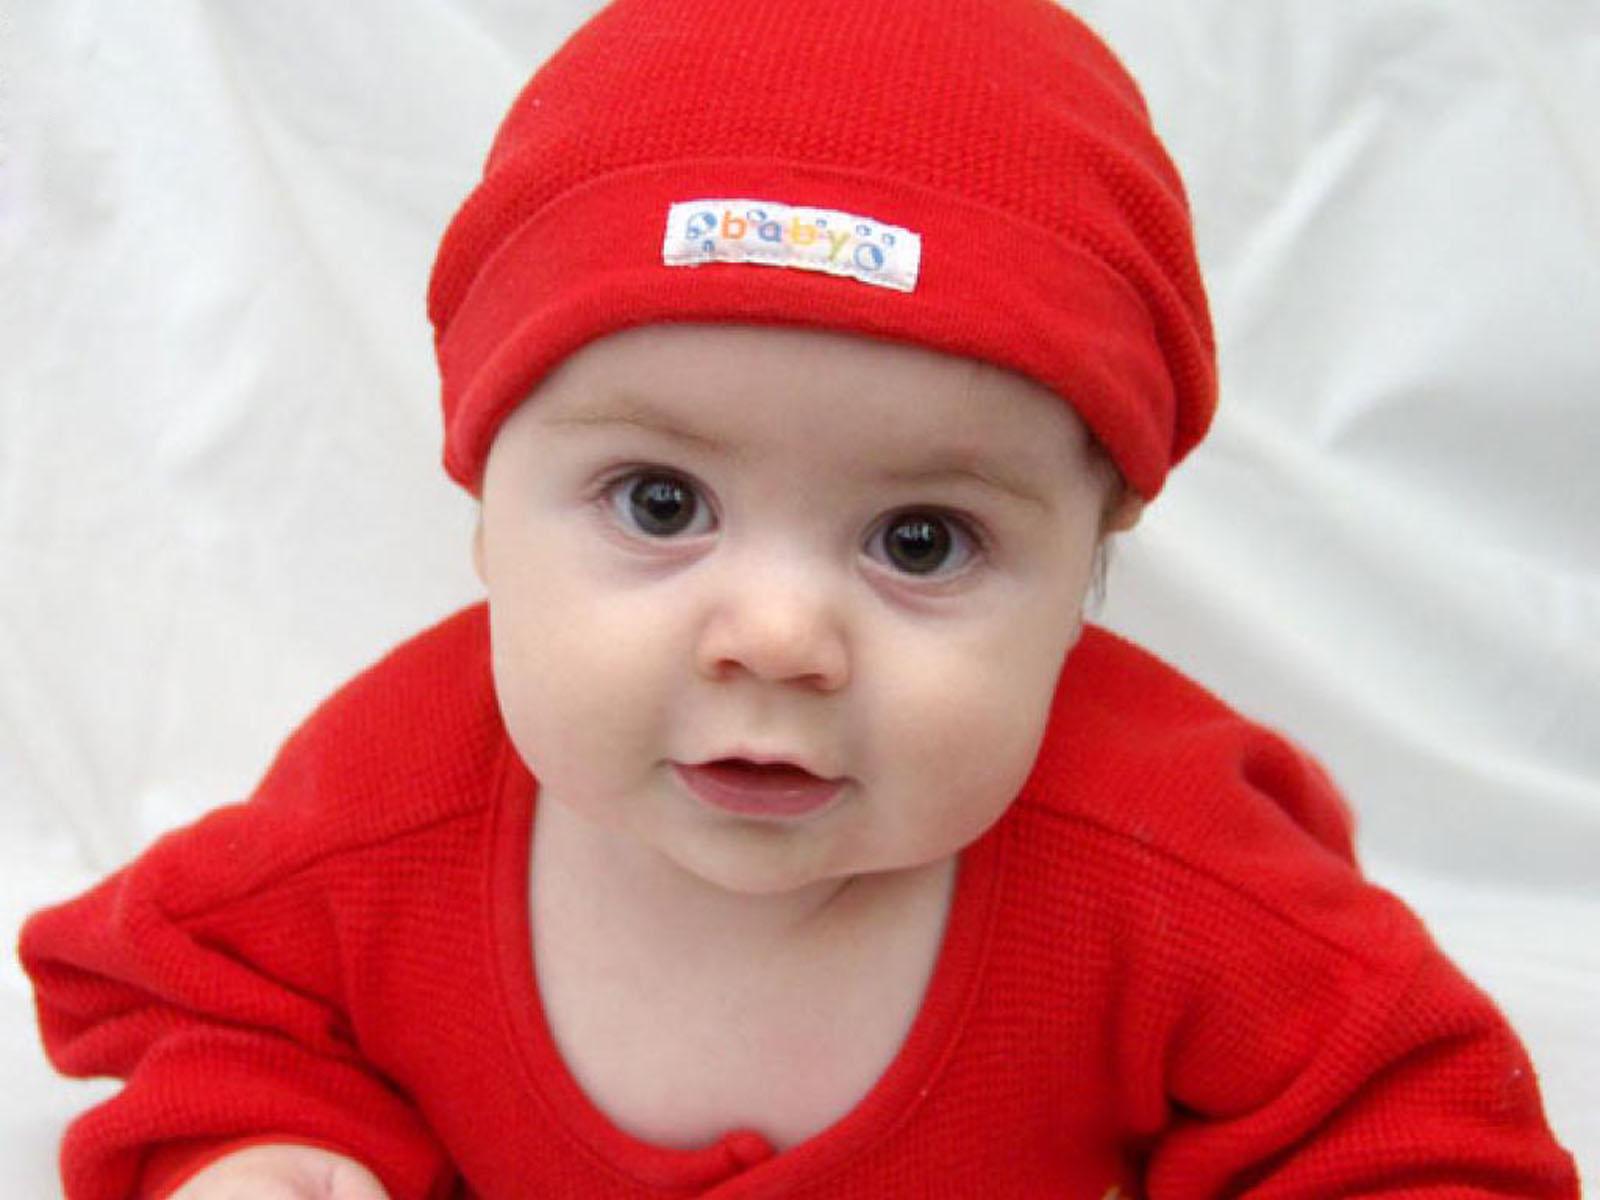 Wallpaper download baby boy - Sweet Babies Wallpapers Wallpapersafari